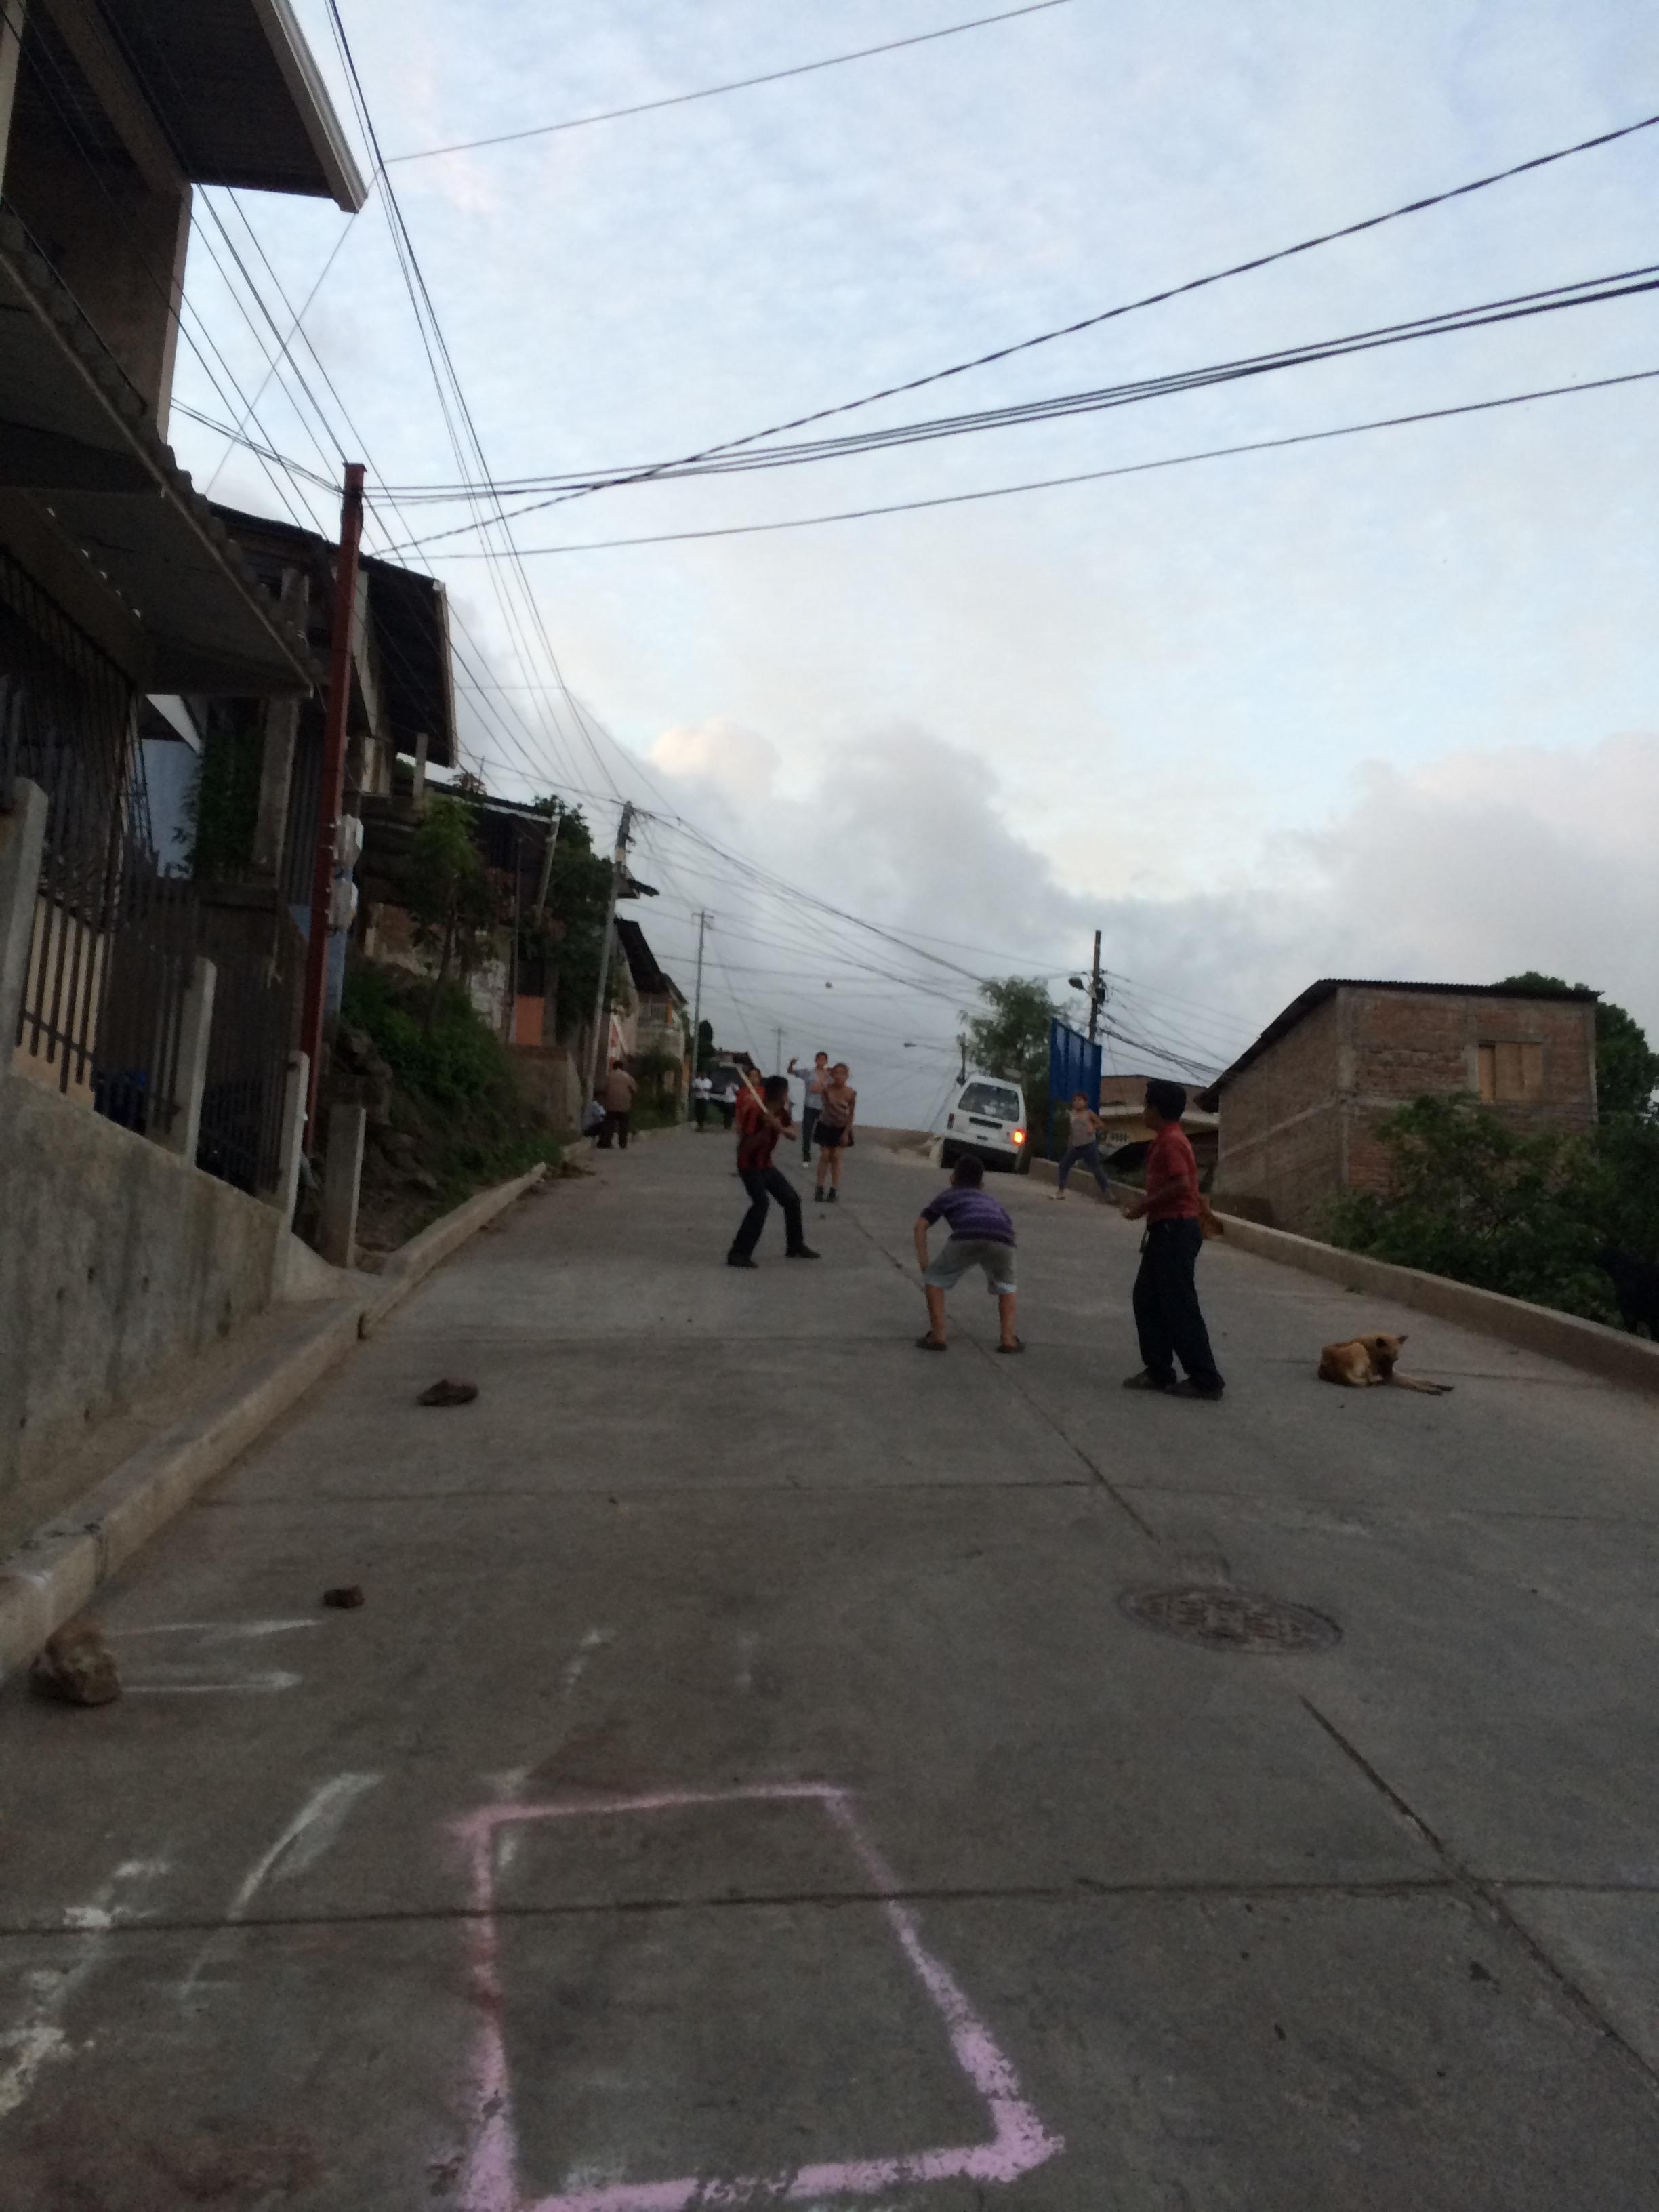 Street Baseball in Matagalpa